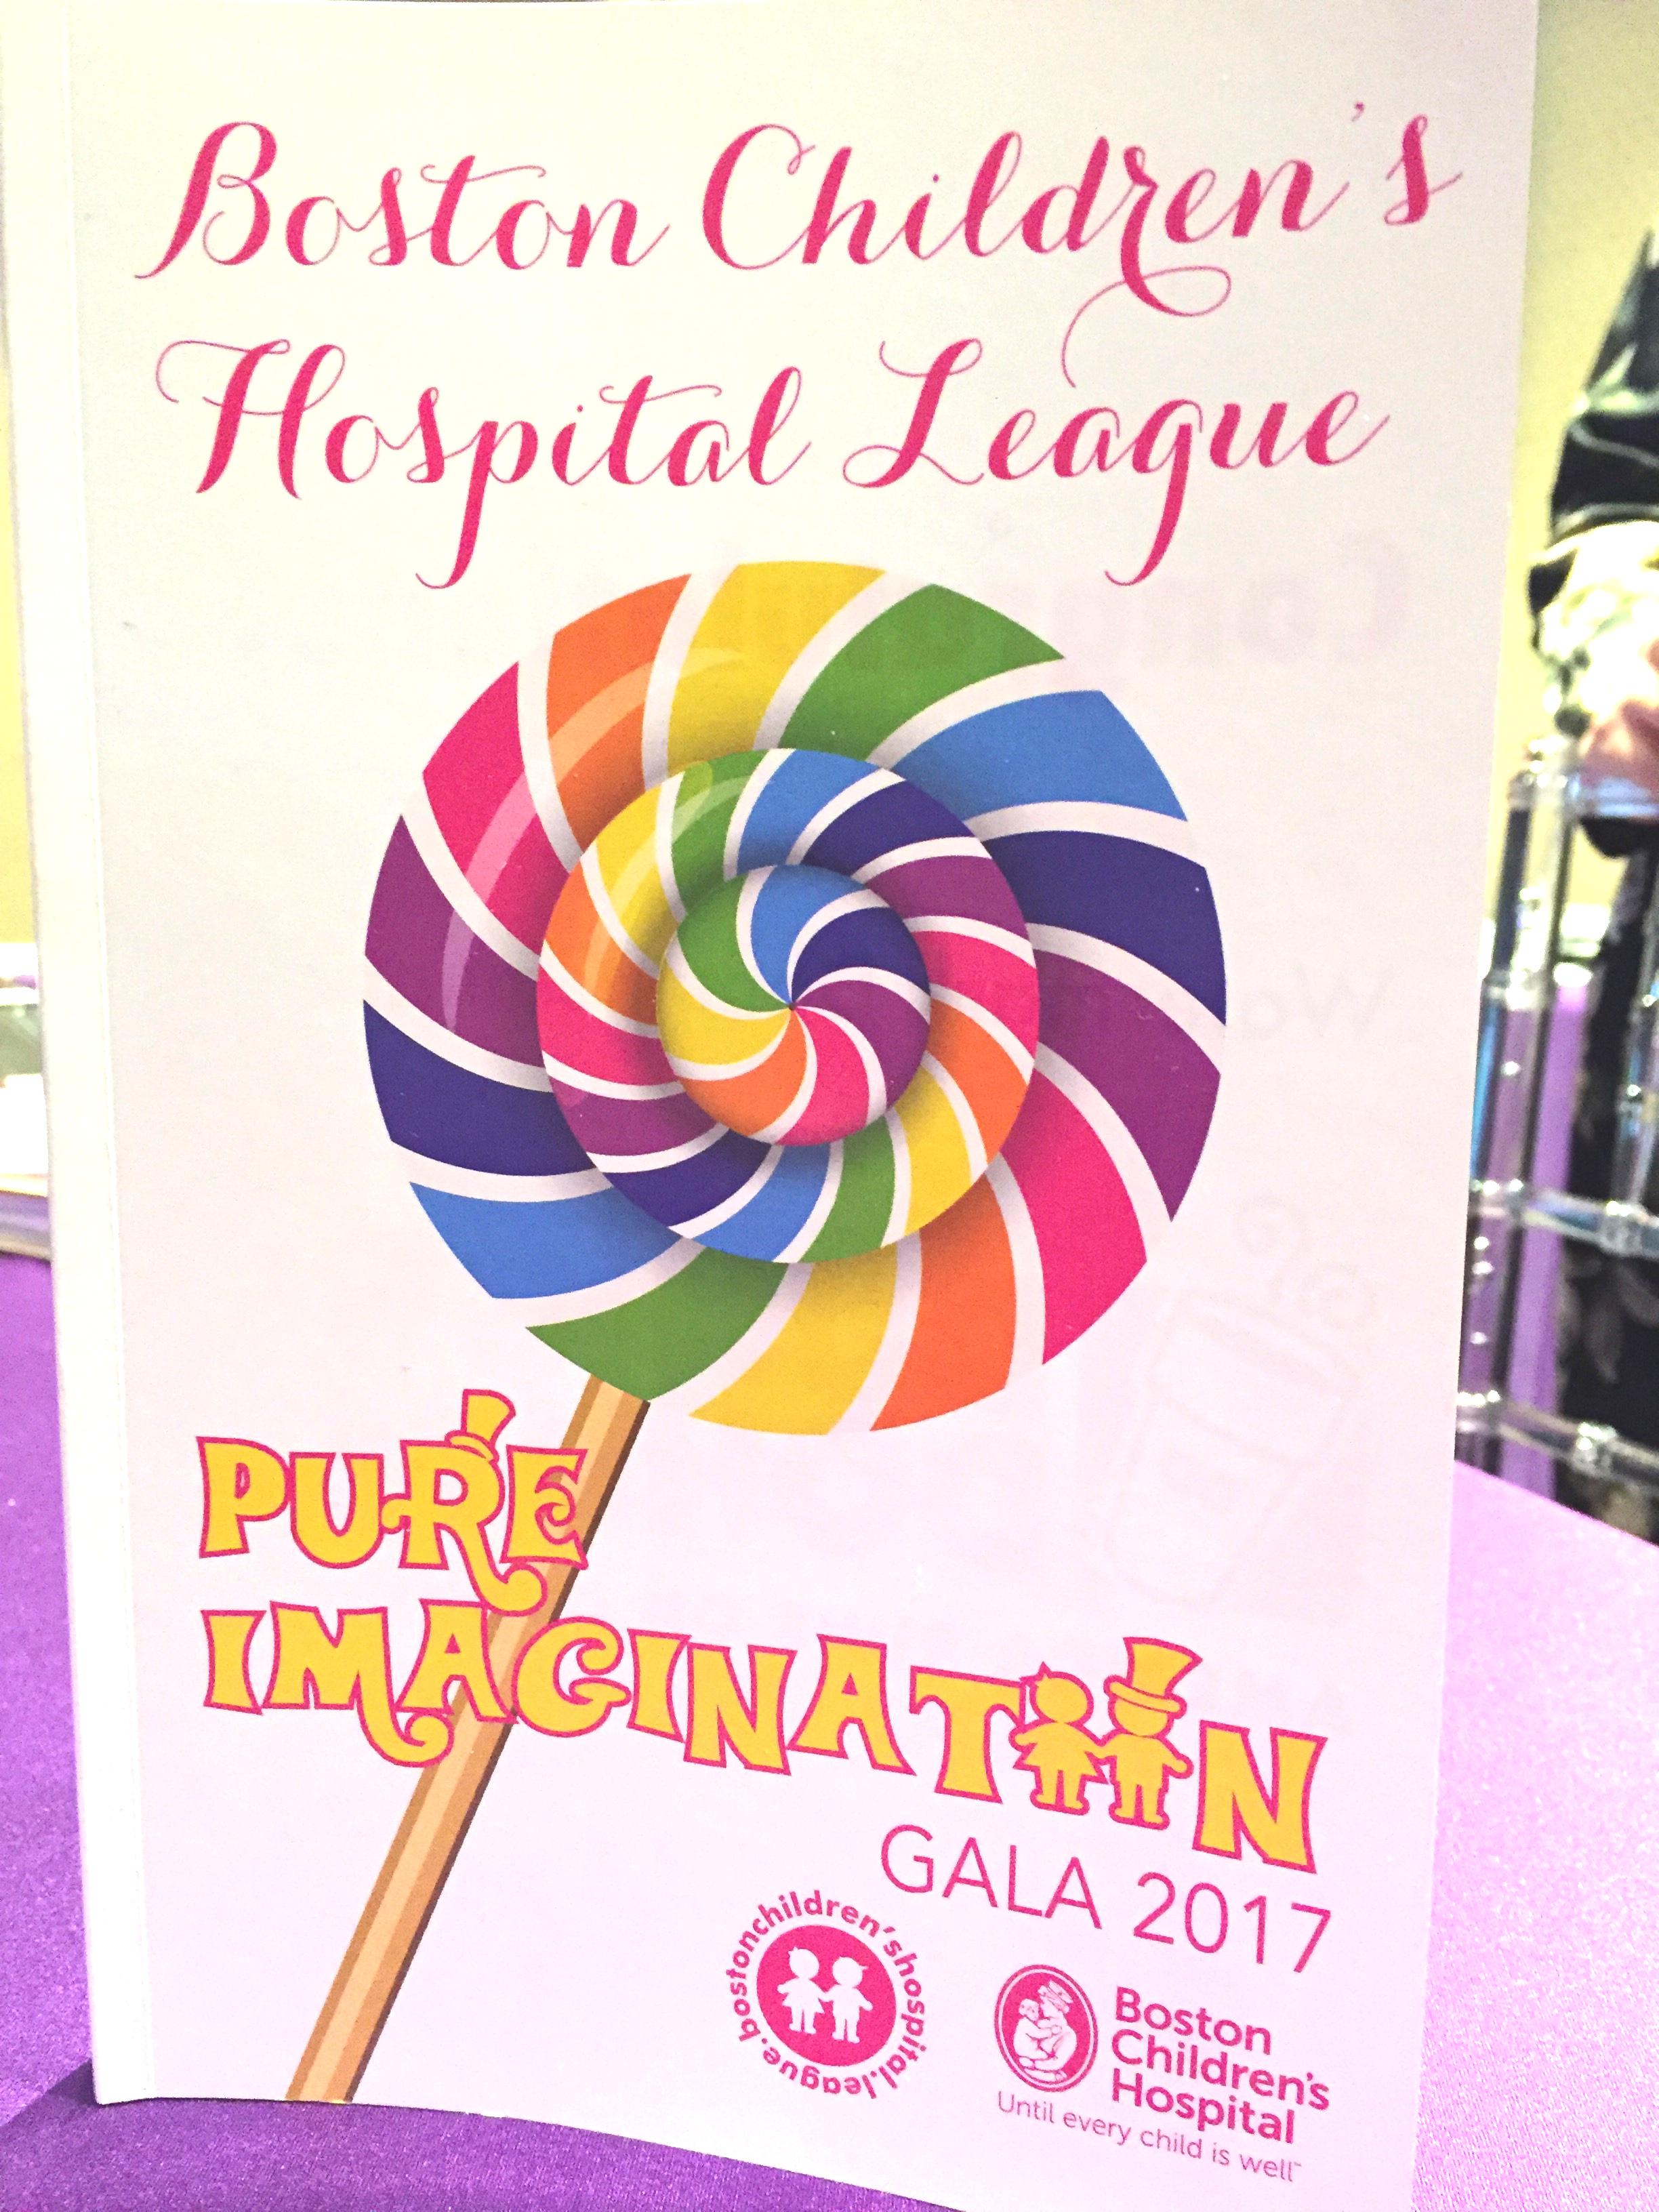 Boston Children's Hospital League Gala (4)